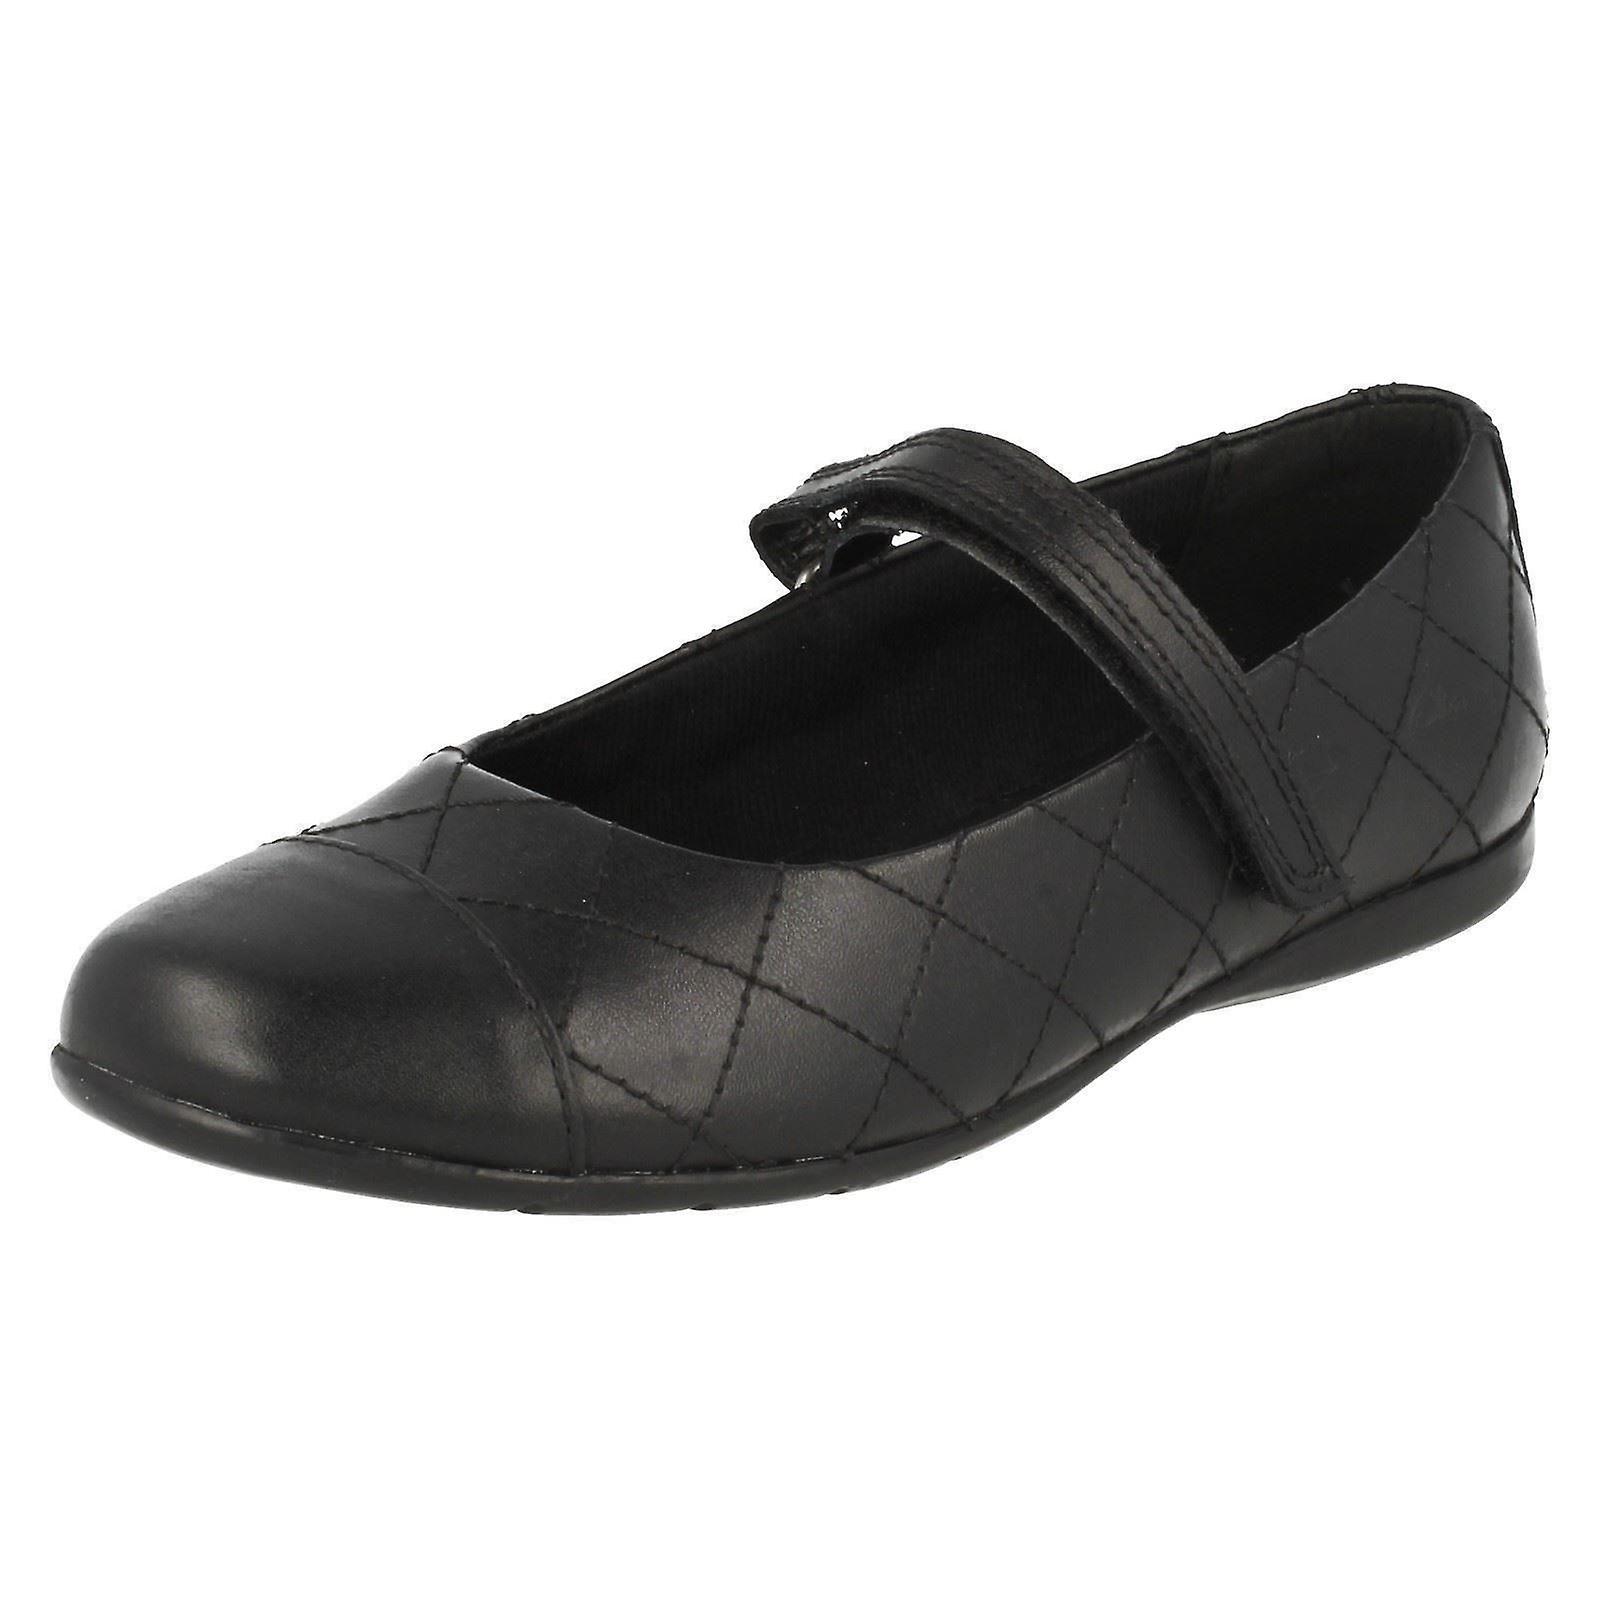 Girls Clarks School scarpe Dance Roxy   Garanzia di qualità e quantità    Uomo/Donne Scarpa